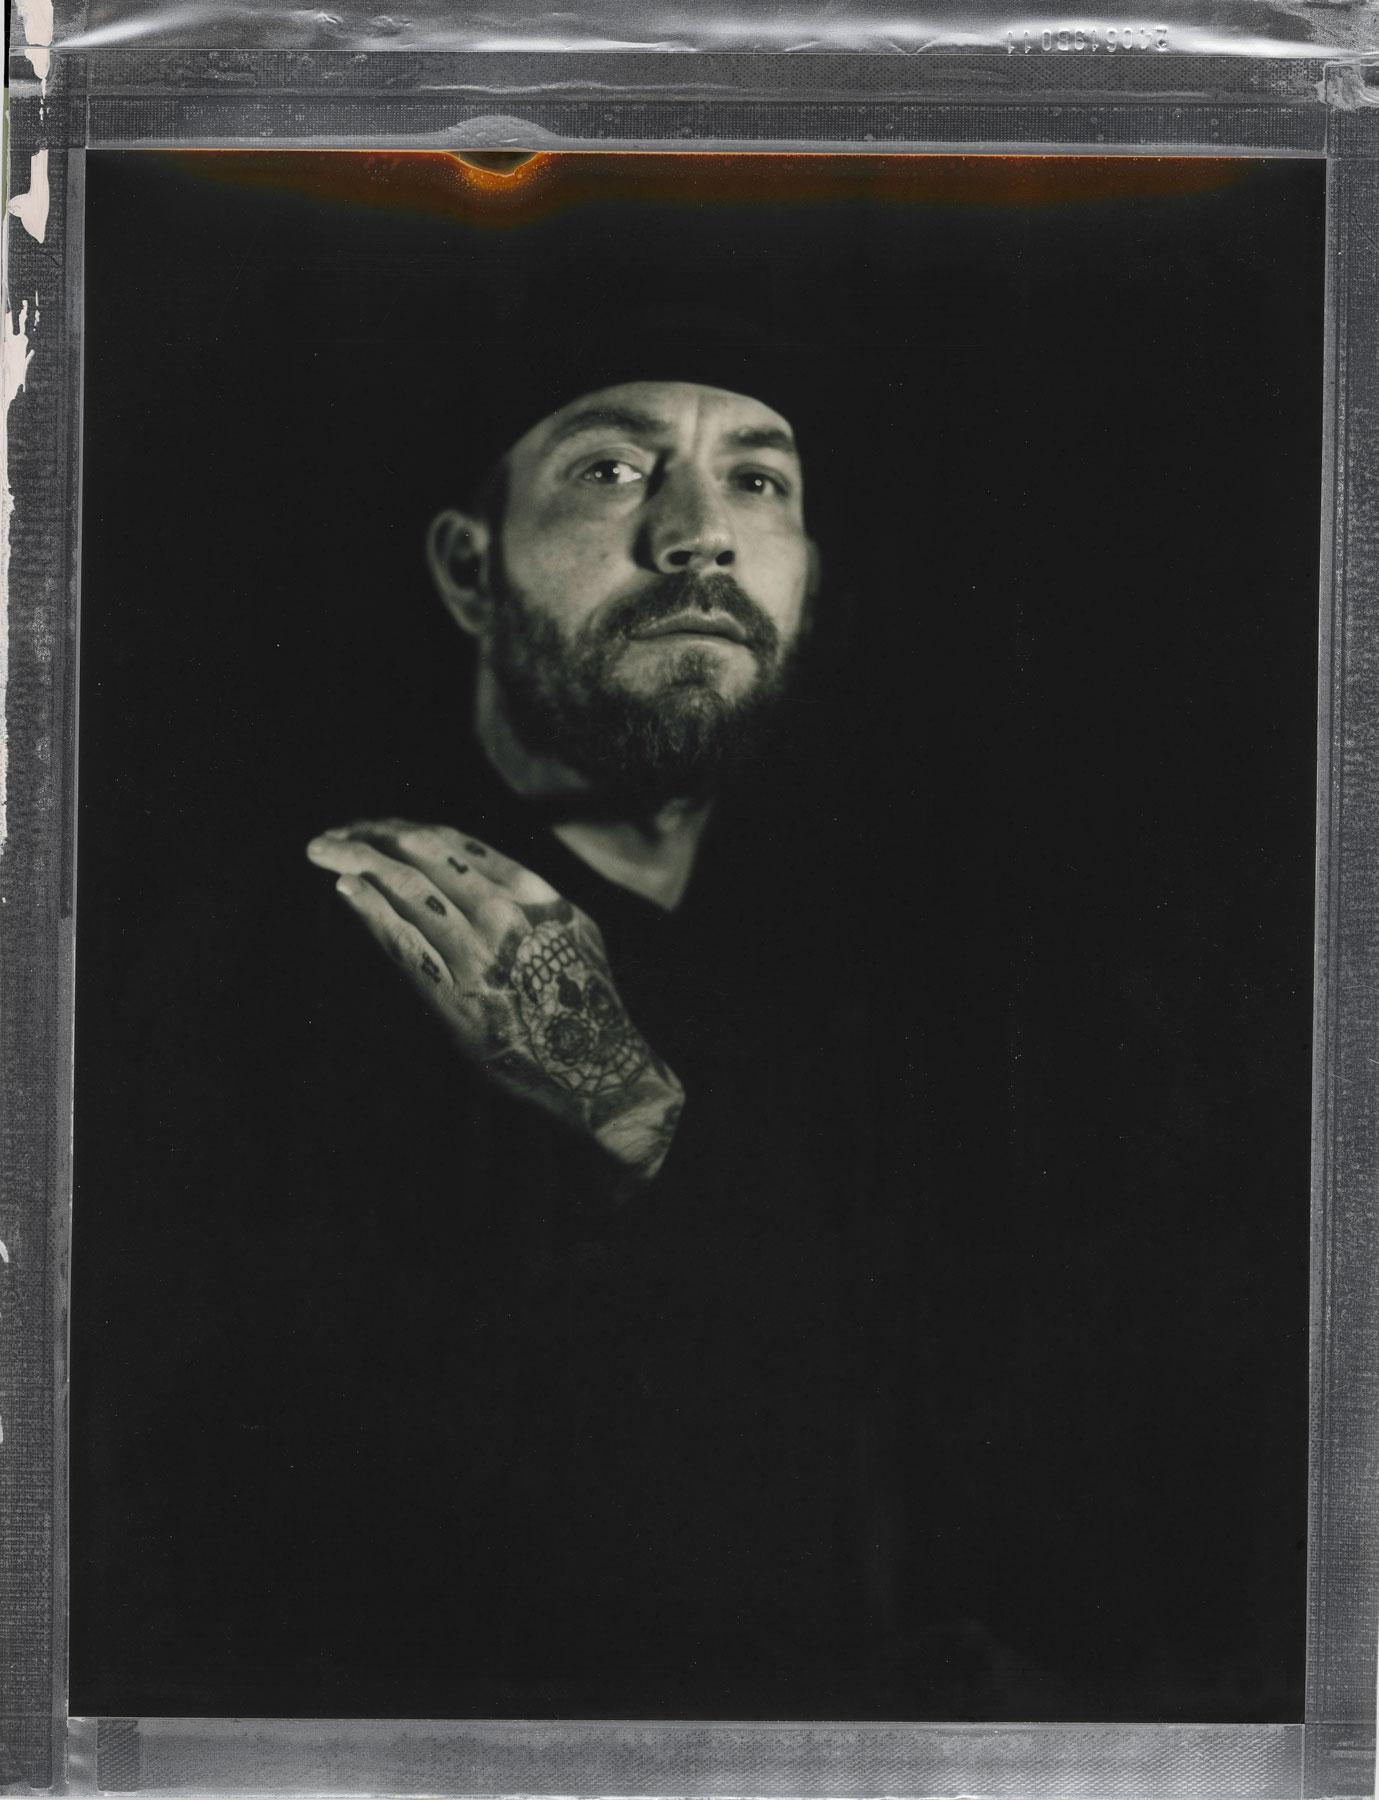 Fotograf i Oslo portretterer en mann med tatoveringer